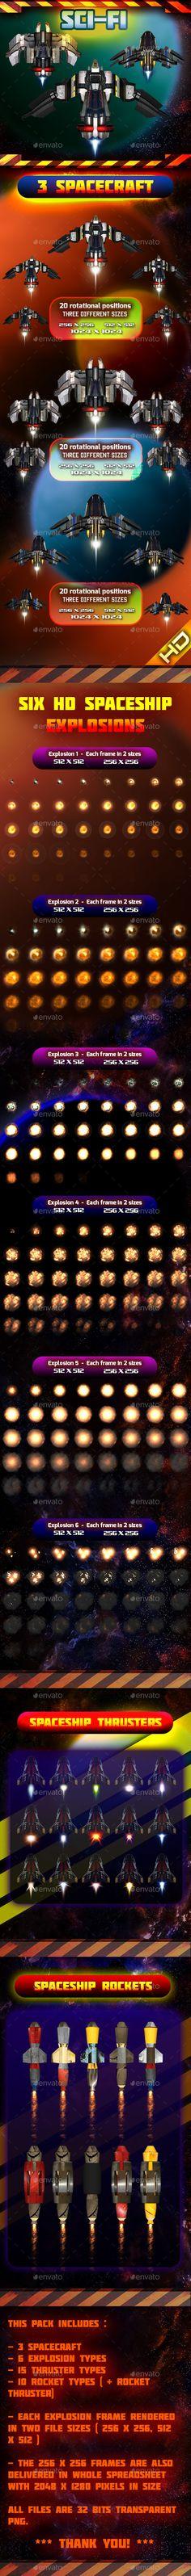 Spaceship Pack 30 - Sprites #Game Assets Download here: https://graphicriver.net/item/spaceship-pack-30/15859384?ref=alena994